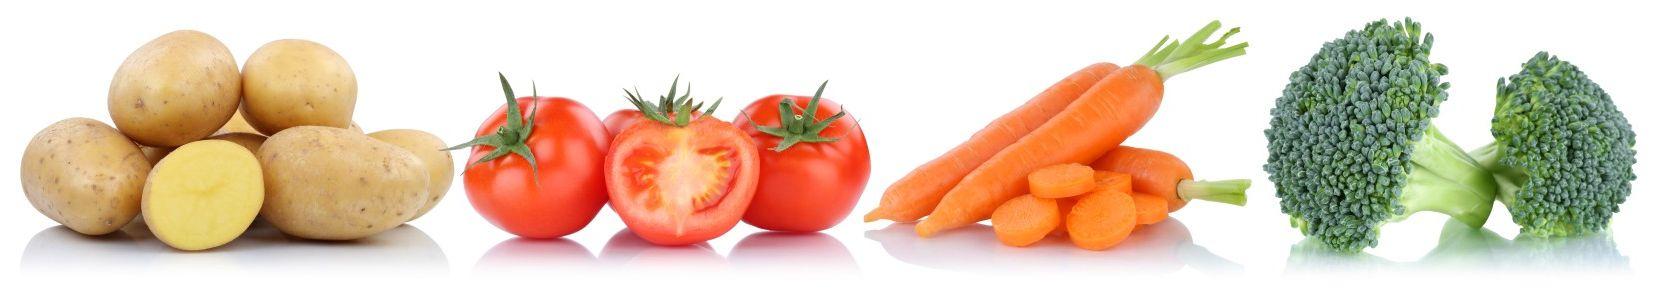 sättigende lebensmittel wenig kalorien